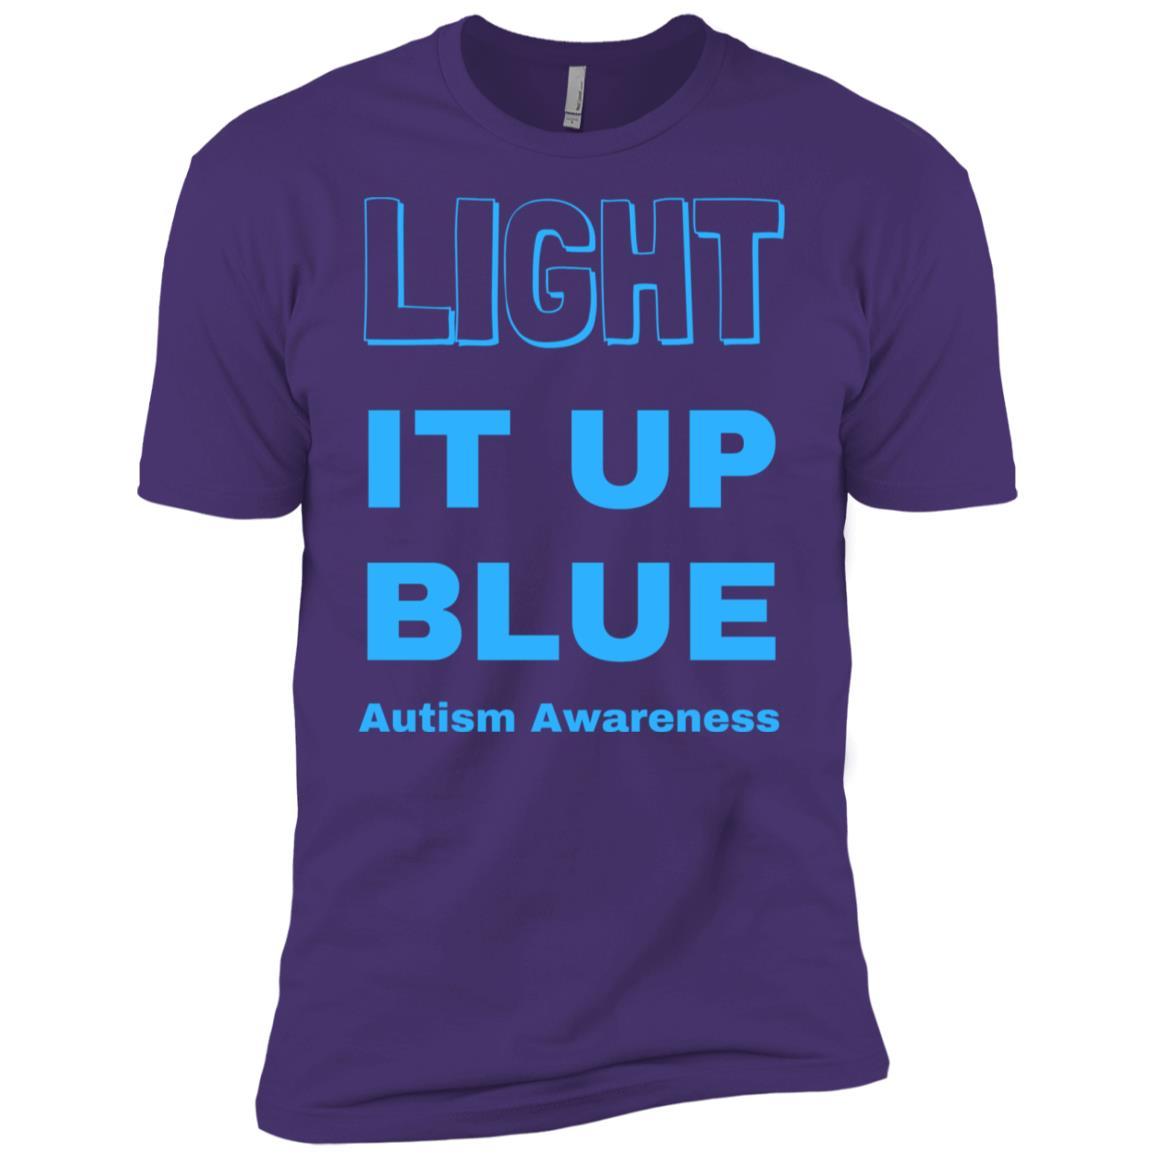 Light It Up Blue Autism Awareness Mom Dad Love Family-1 Men Short Sleeve T-Shirt